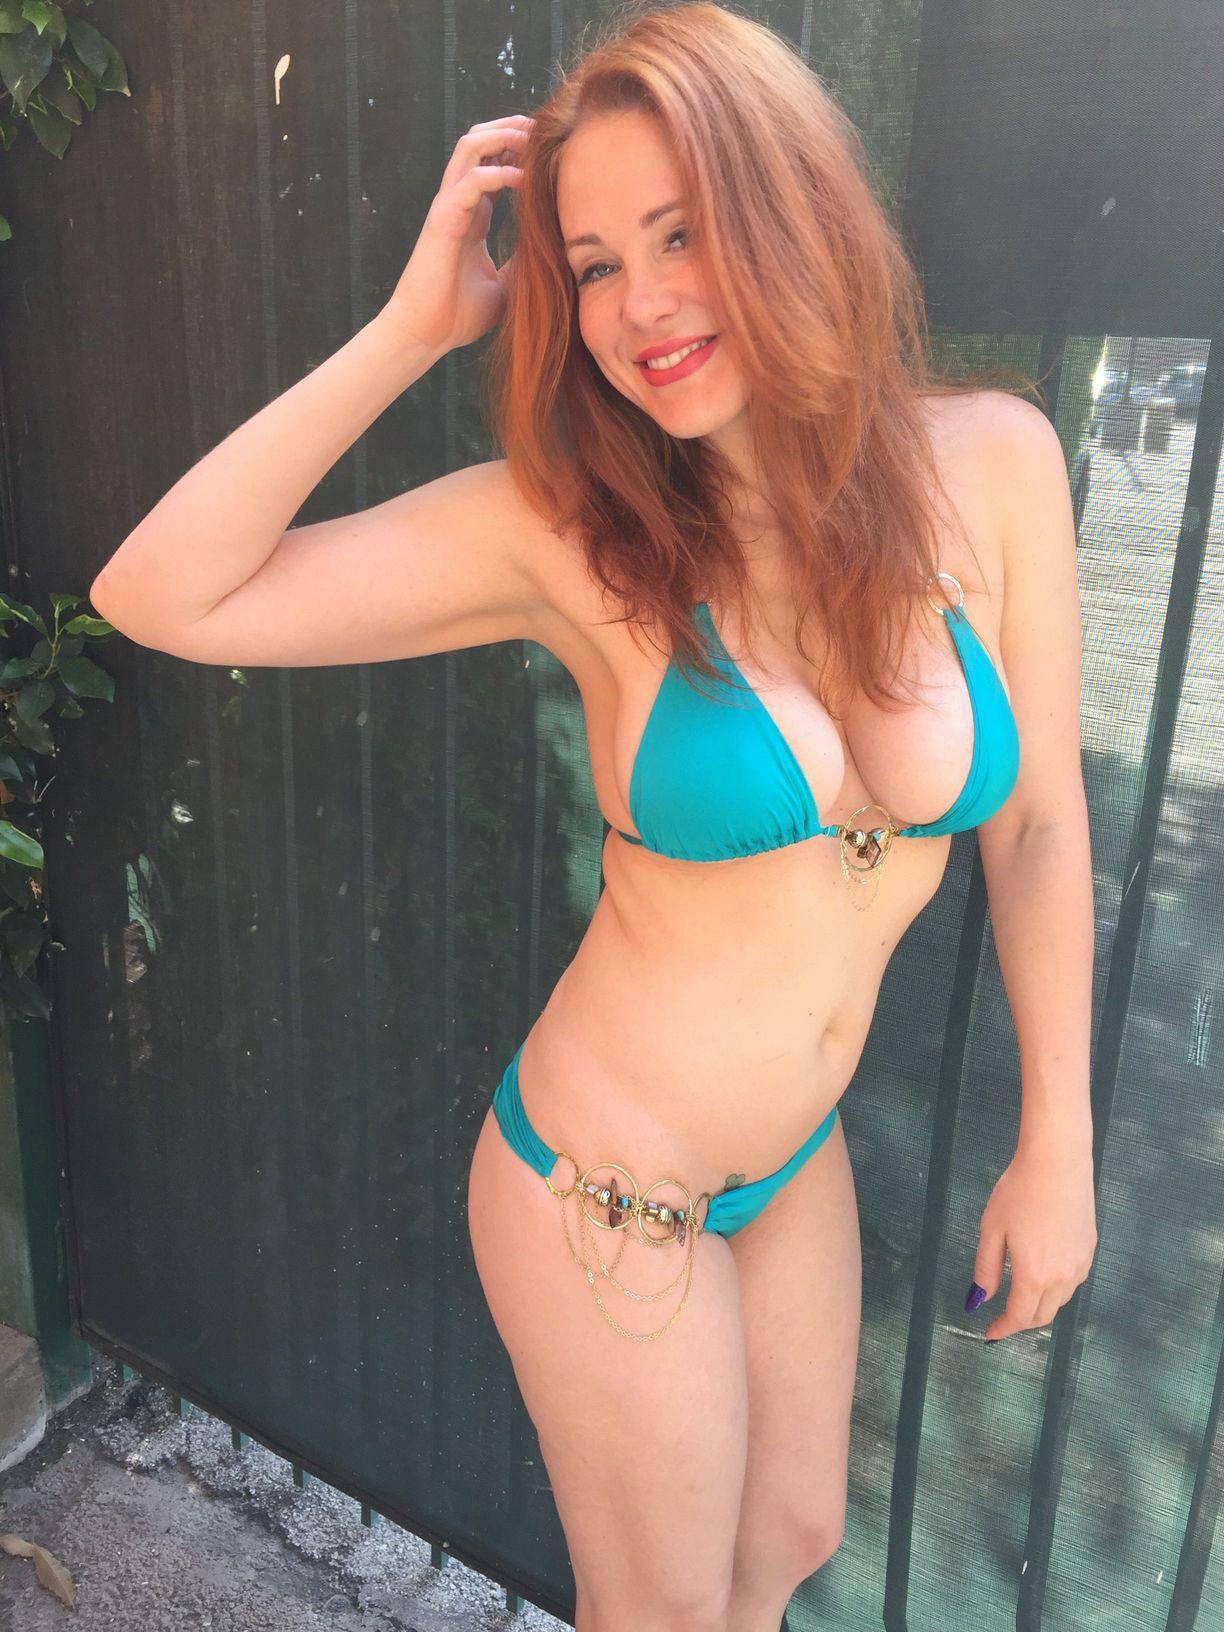 Maitland Ward in Bikini 4 TheFappening.nu